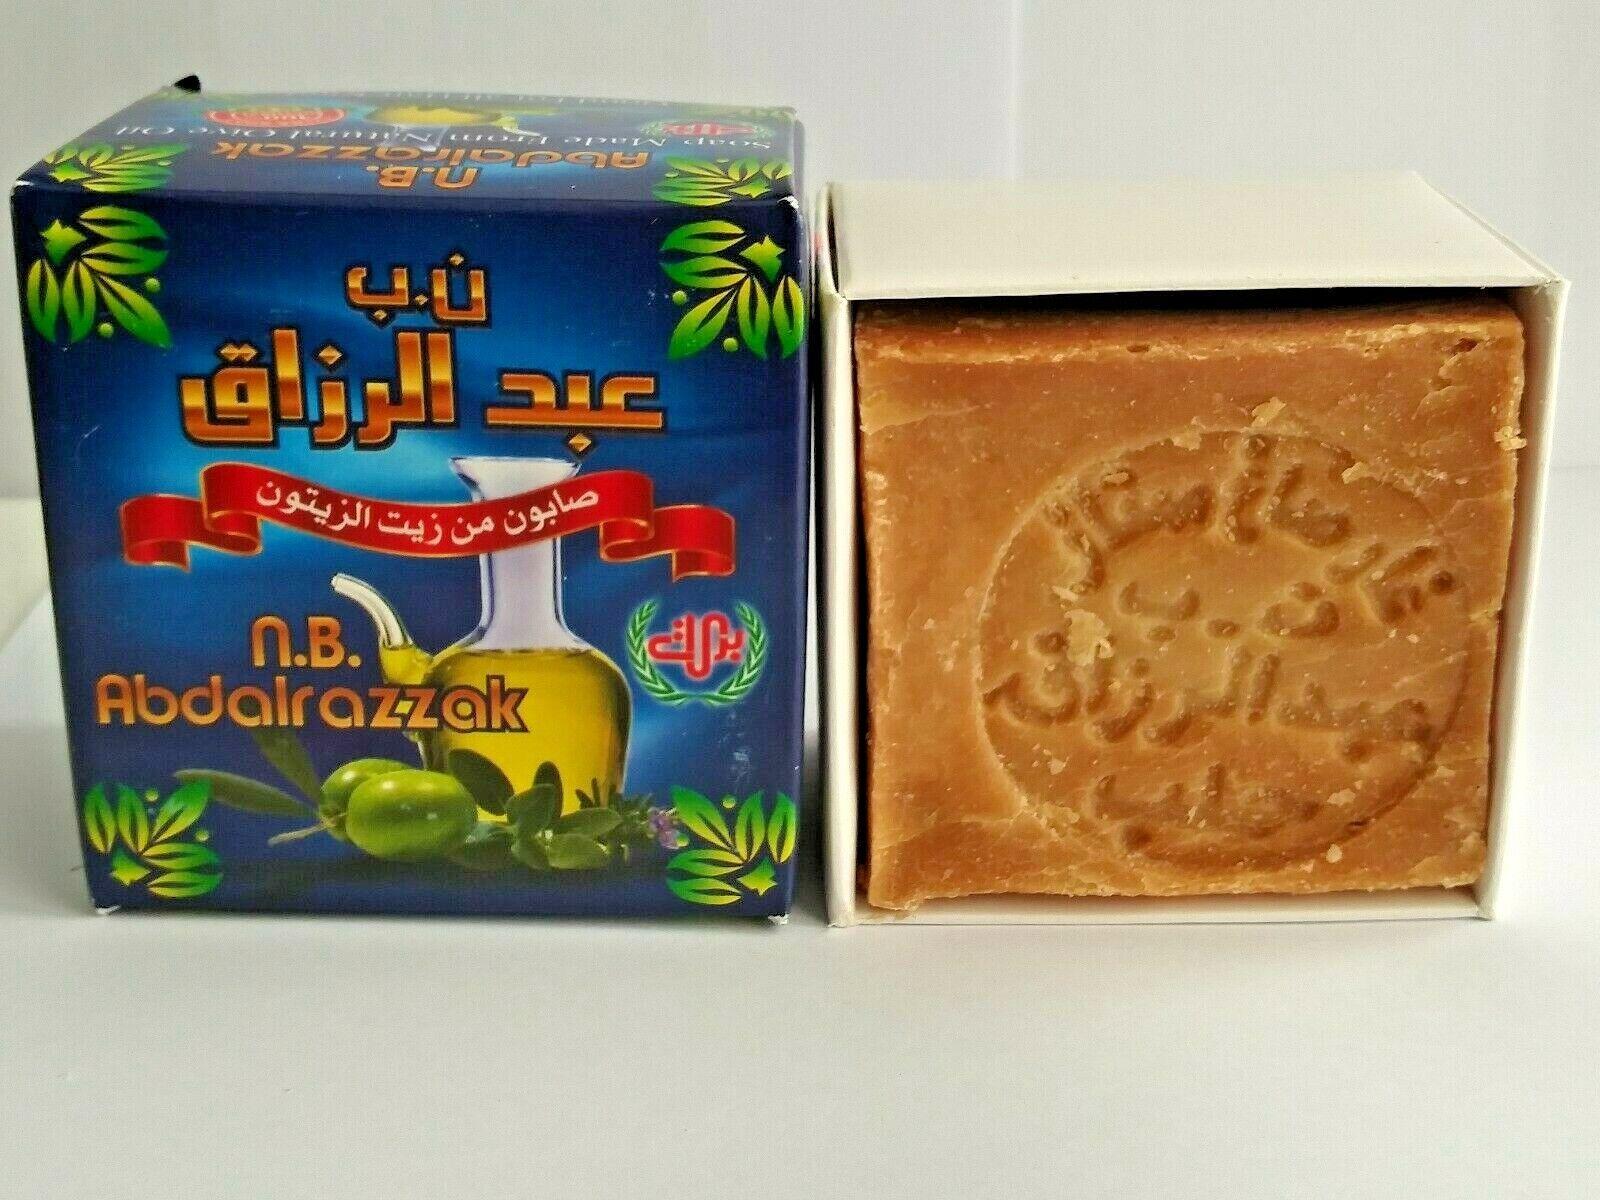 Olive & Laurel Soap 100% Natural Good for Hair, Face & Body